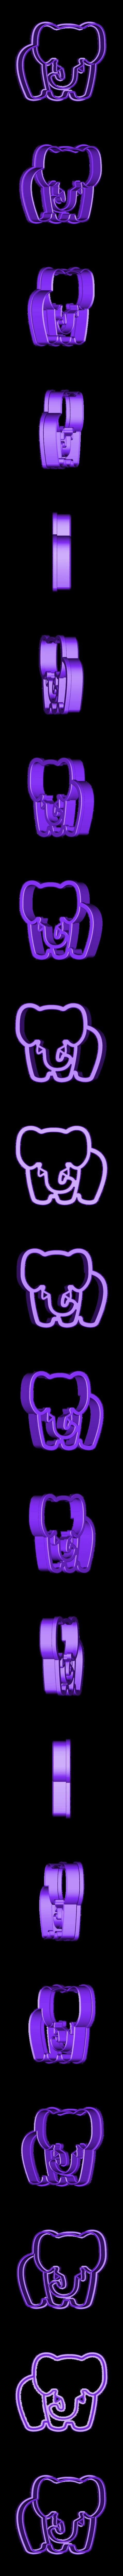 Model.stl Download free STL file Elephant • 3D printing object, 3DBuilder